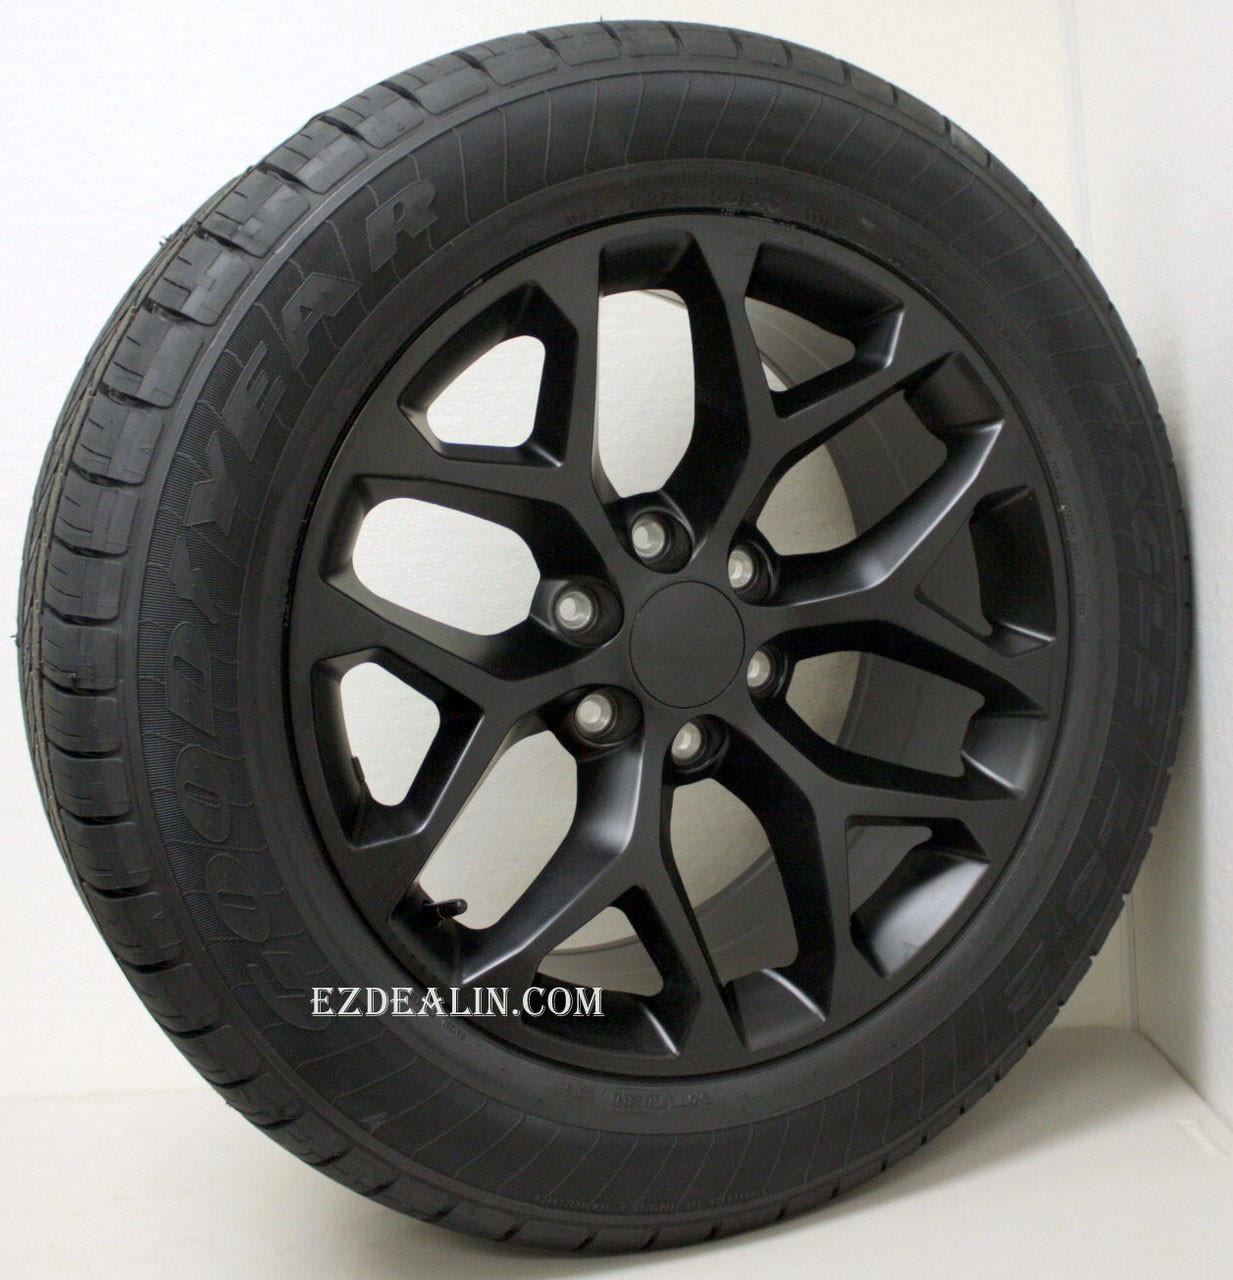 "Satin Matte Black 20"" Snowflake Wheels with Goodyear Tires for GMC Sierra, Yukon, Denali - New Set of 4"